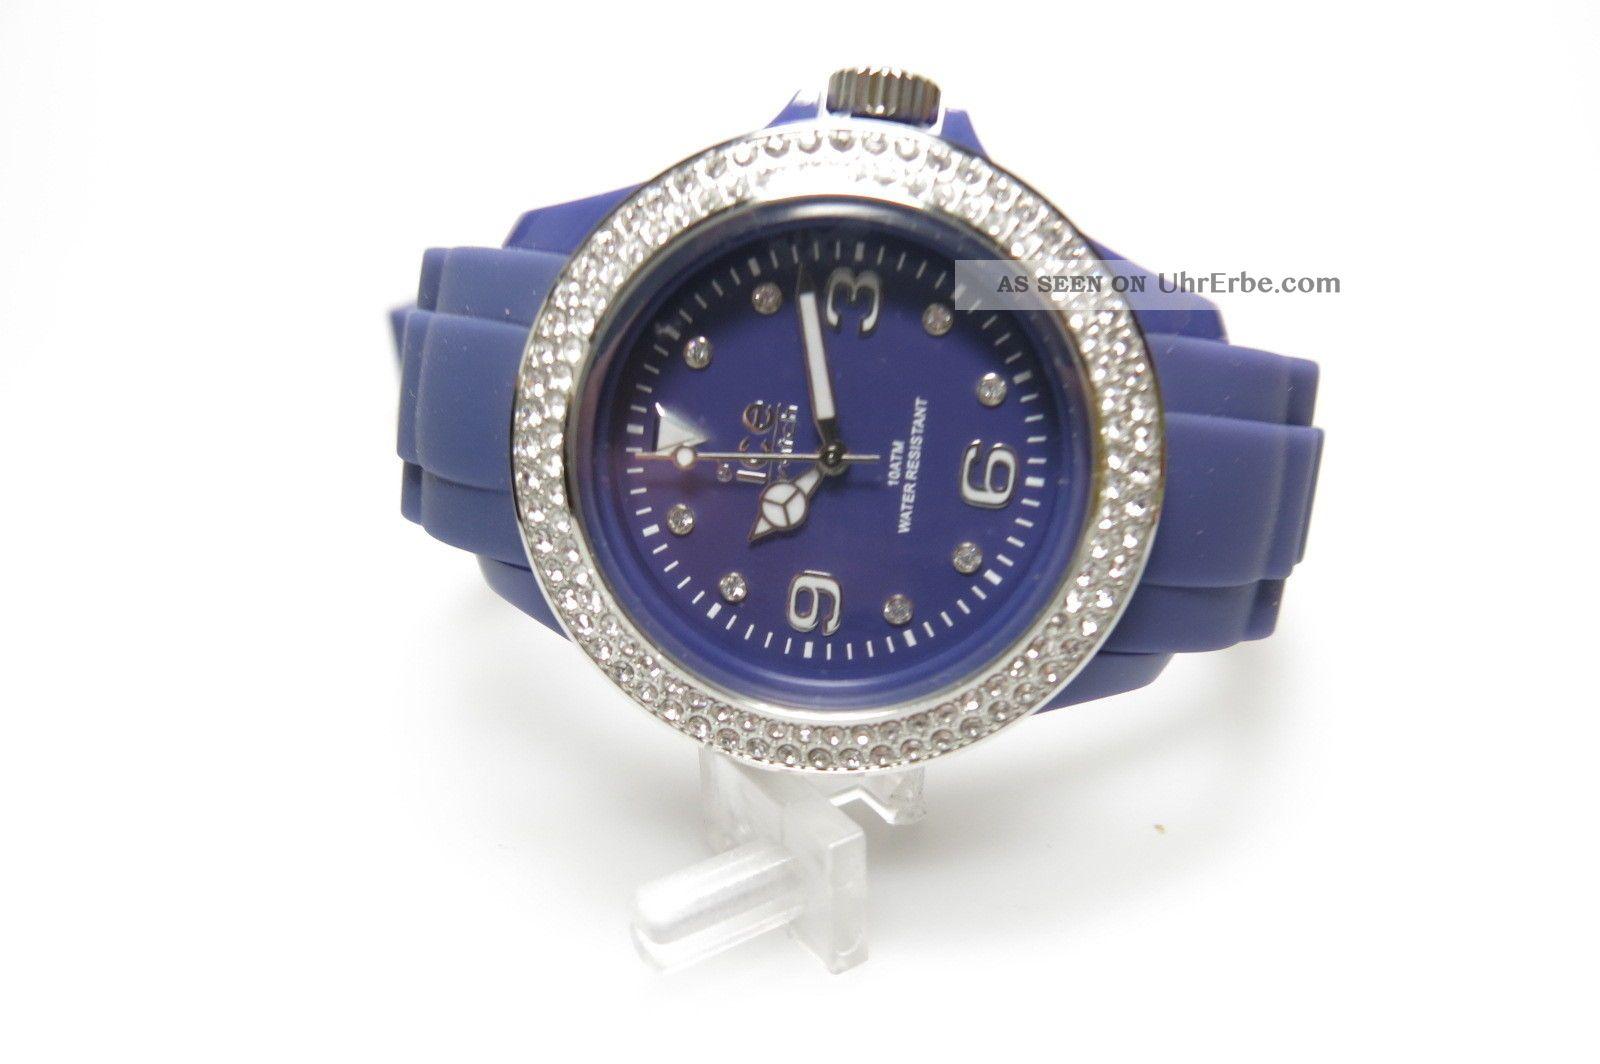 Ice Watch St. Psd. U. S. 10 Stone Purple Silver Sili